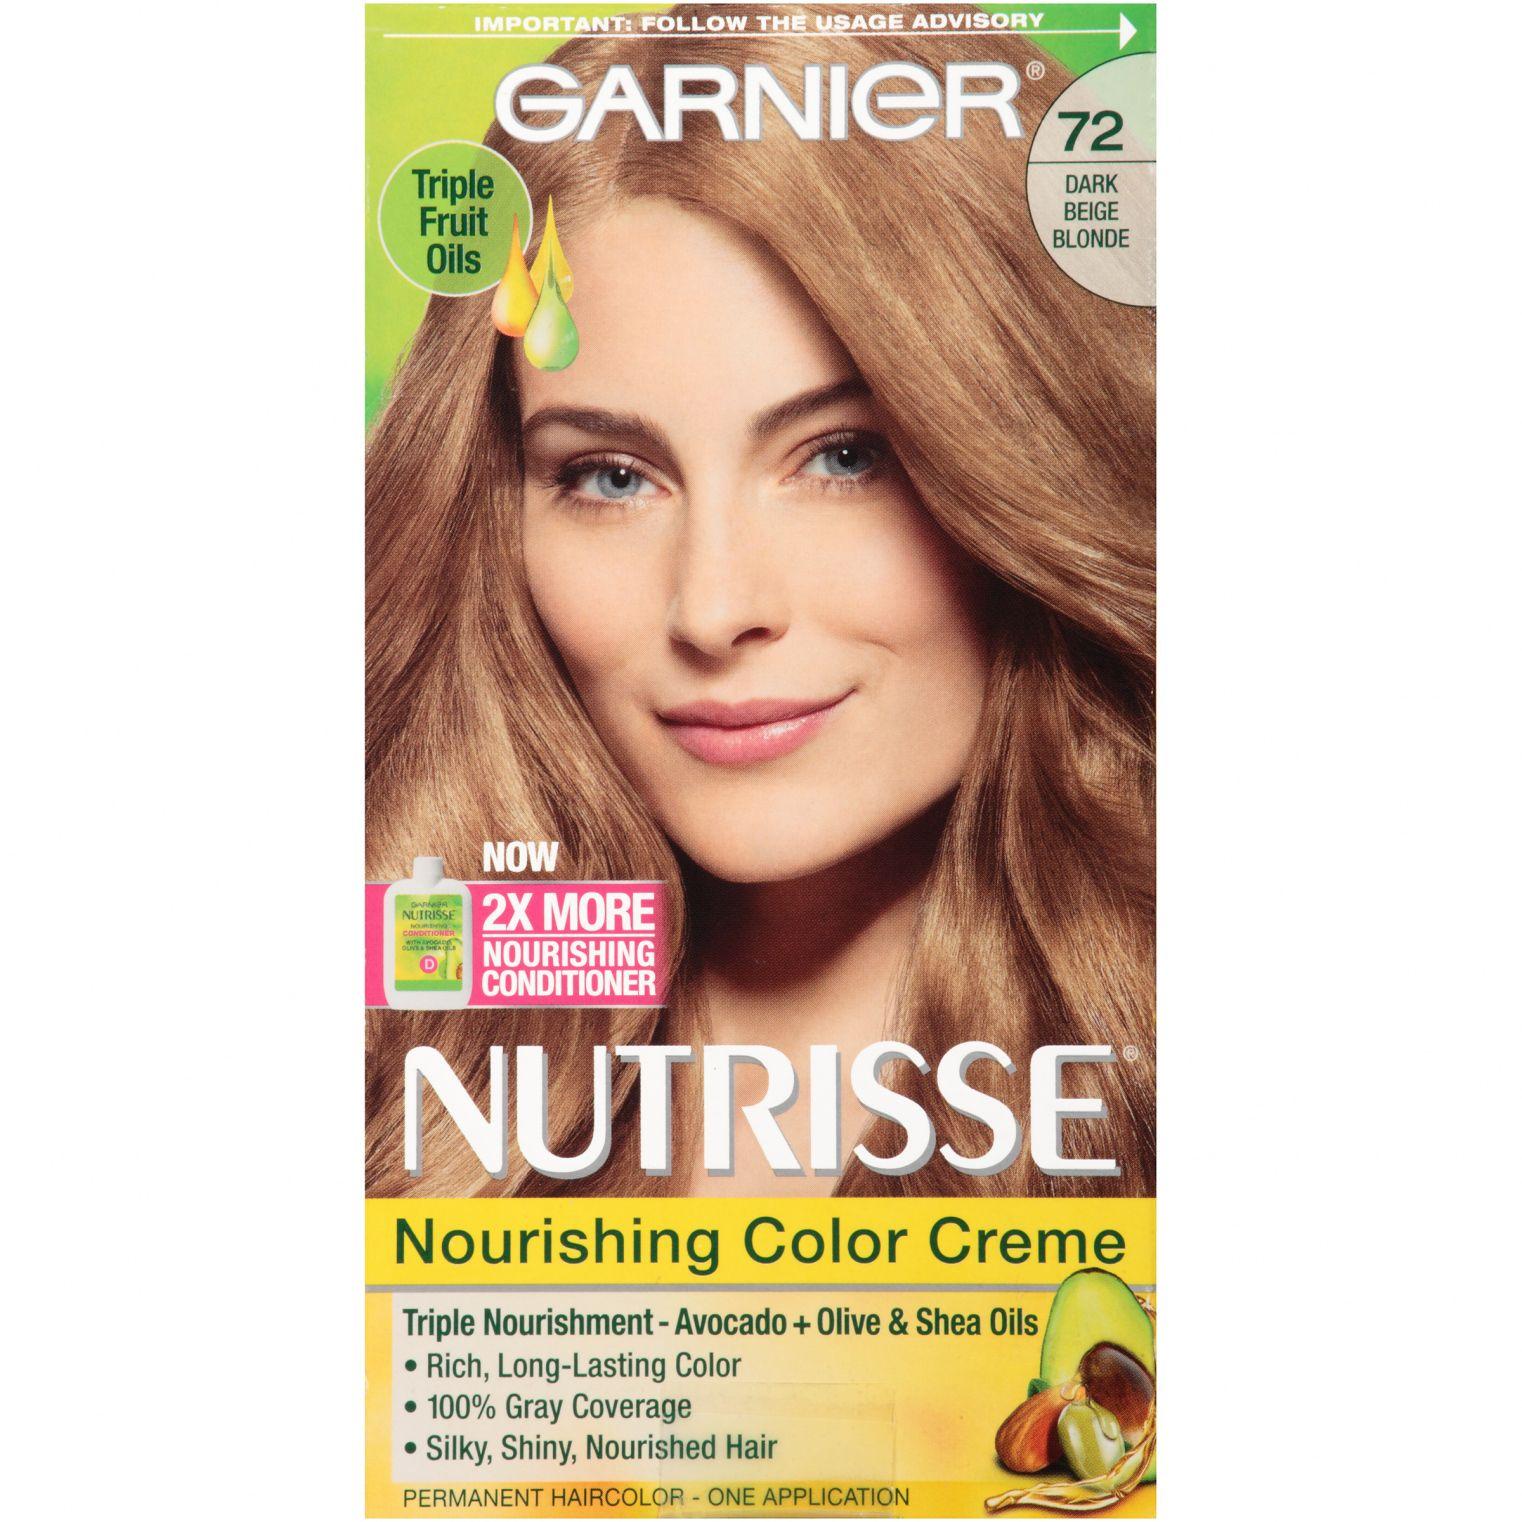 Dark Blonde Hair Dye Walmart Best Color Hair For Hazel Eyes Check